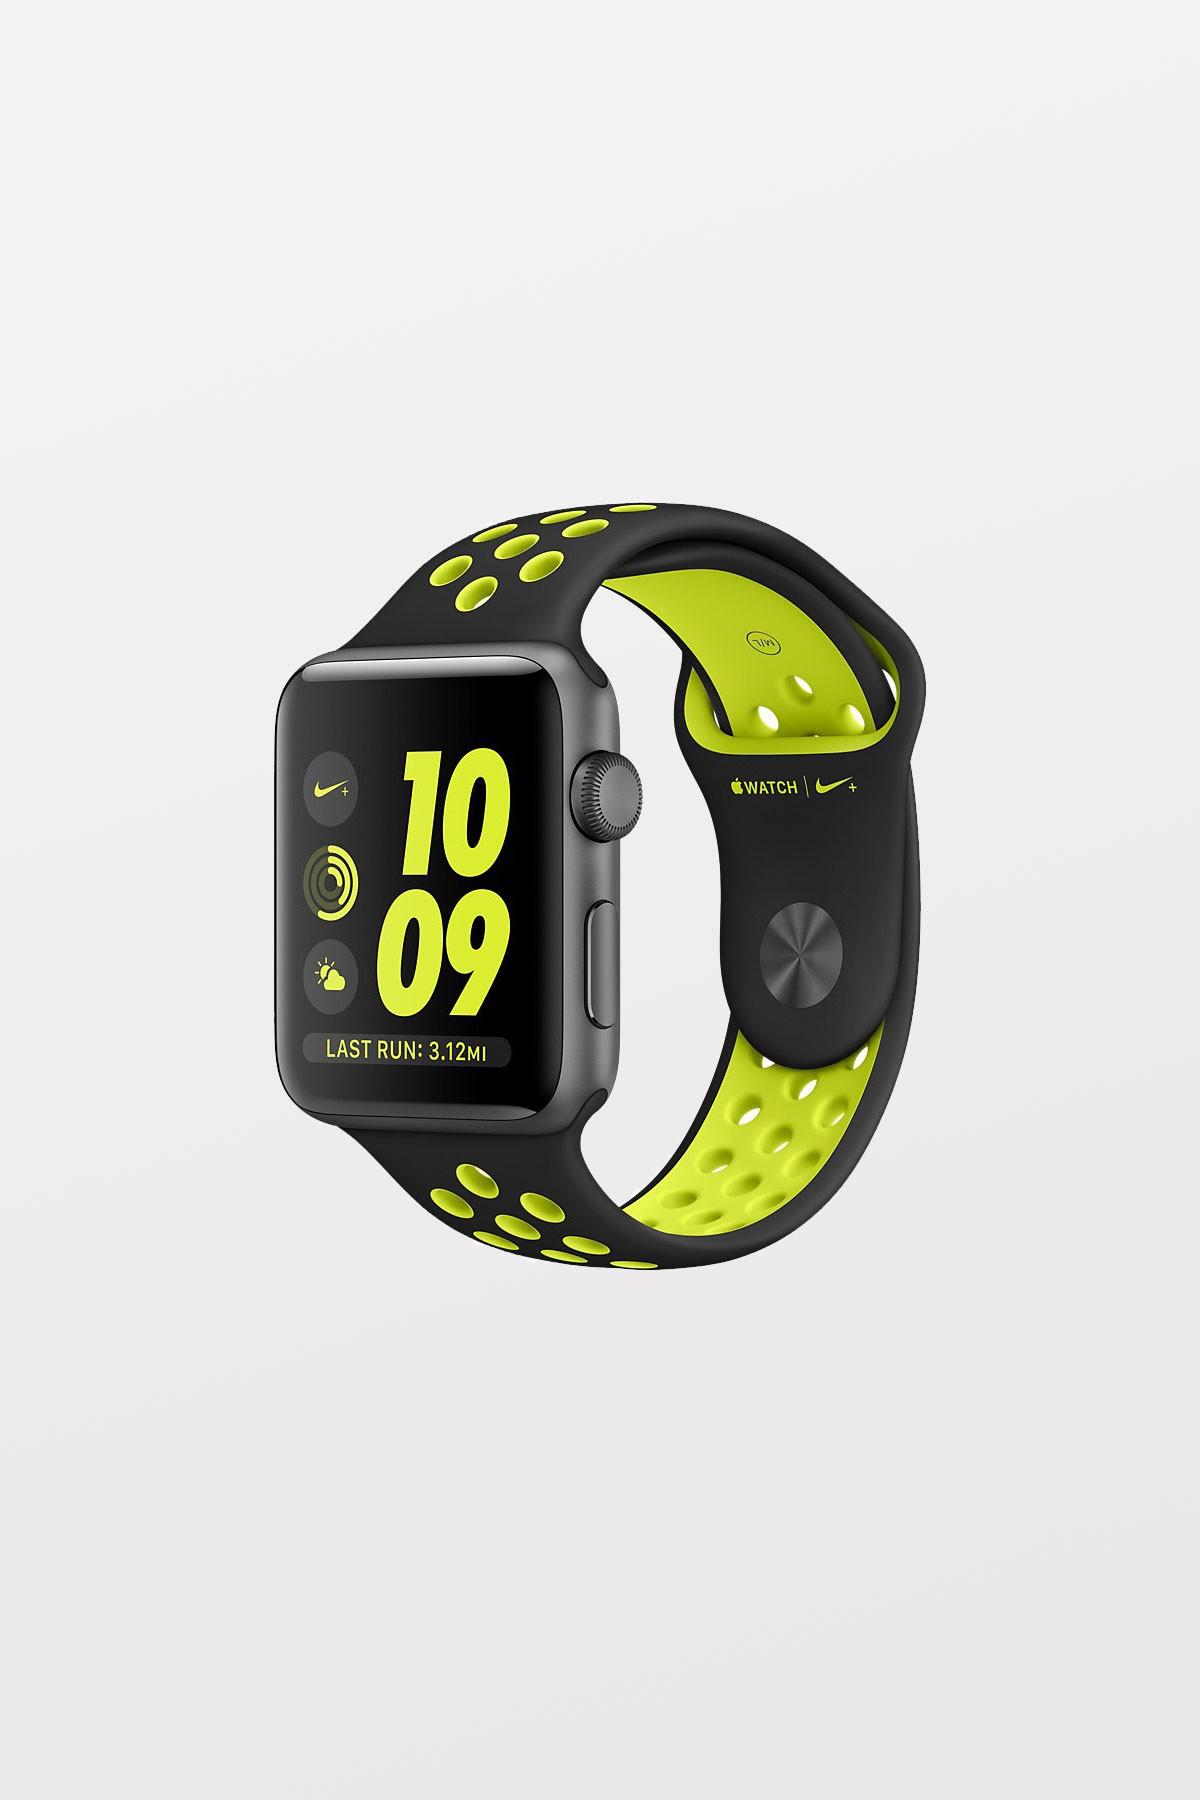 Apple Watch Series 2 Nike+ - 38mm - Space Grey Aluminium, Black/Volt Nike Sport Band - Refurbished